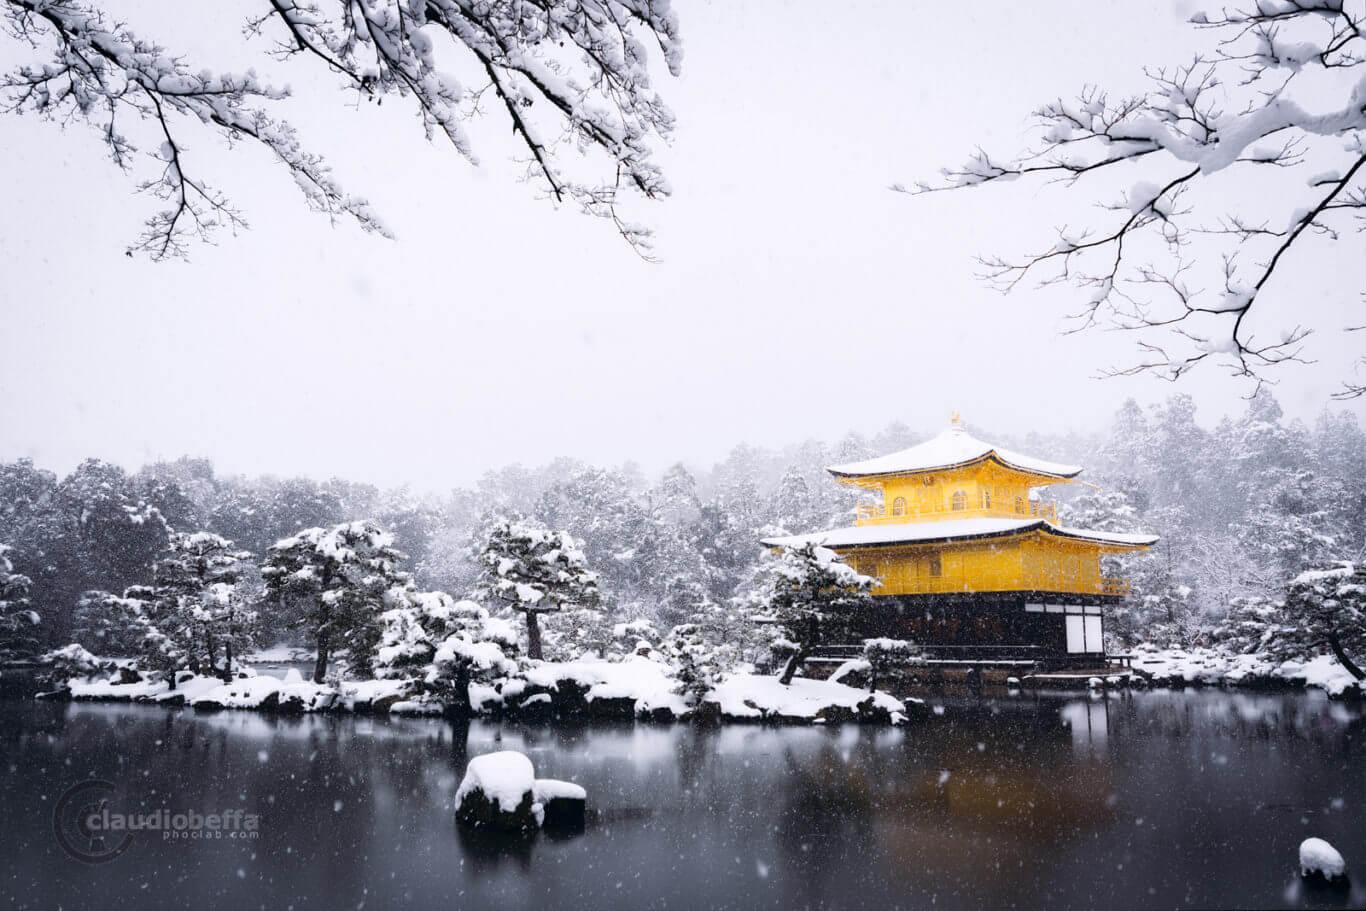 Kinkakuji golden vision, Kinkakuji, Gold, Snow, Snowfall, Garden, White, Trees, Pond, Kyoto, Japan